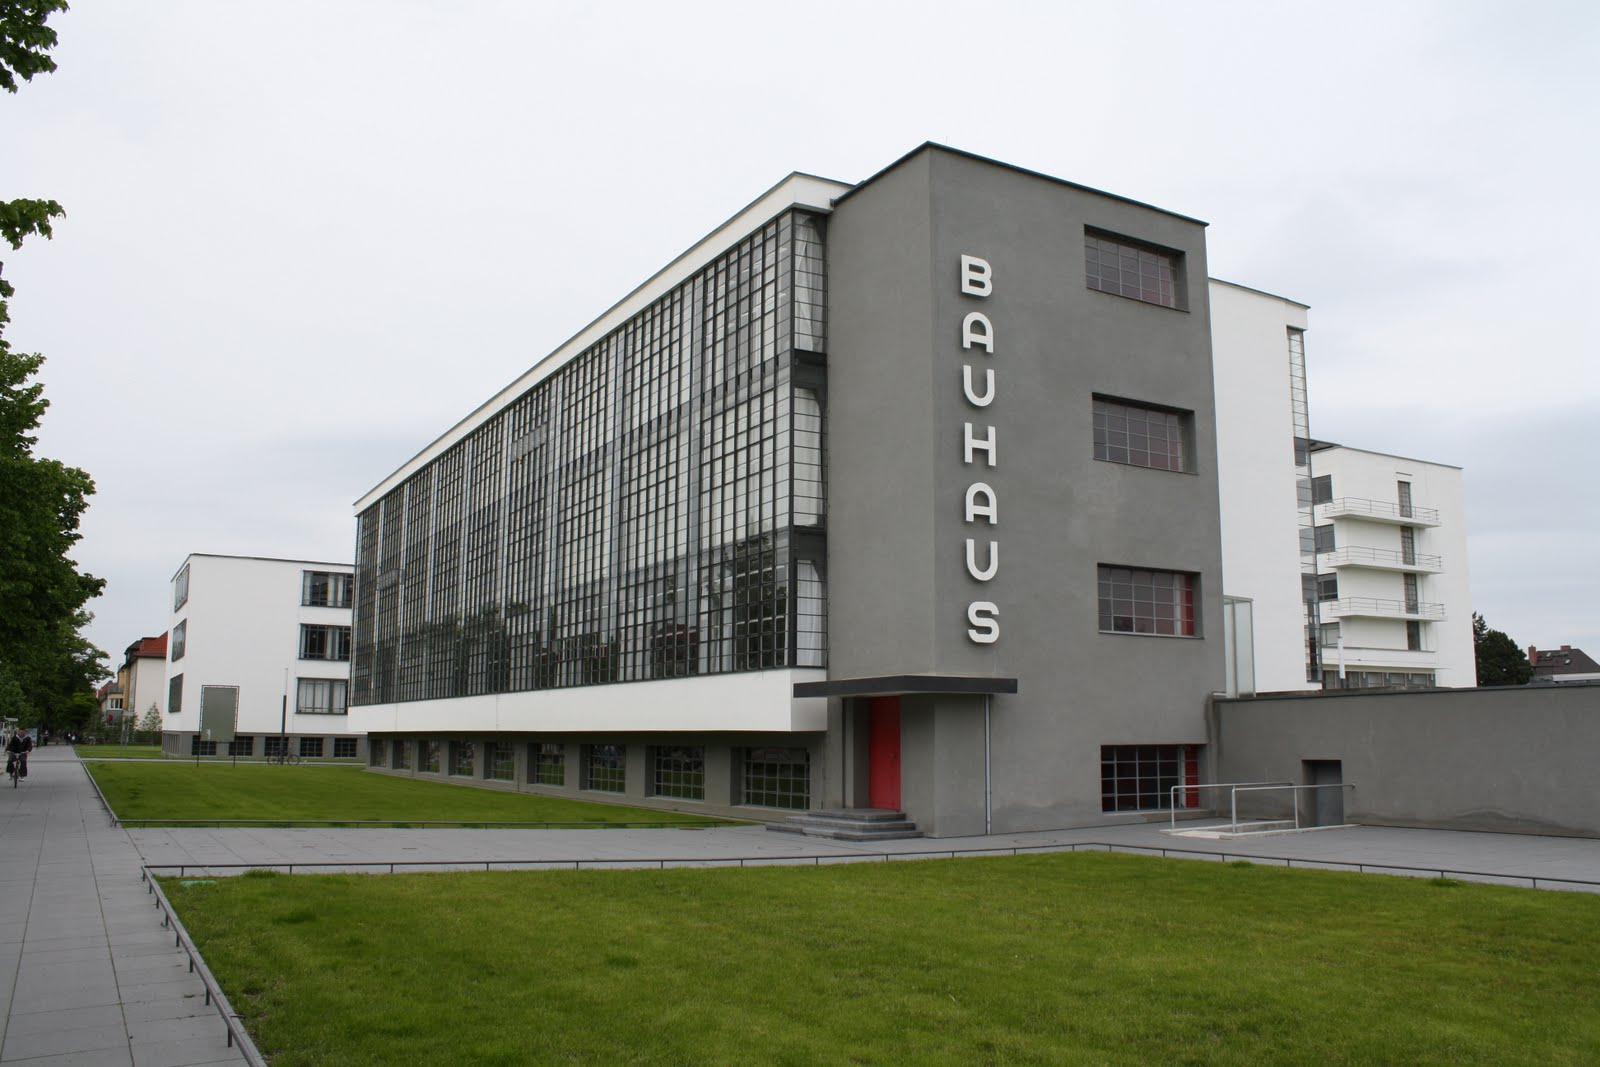 Otti arquitetura design fotografia bauhaus for Staatliches bauhaus